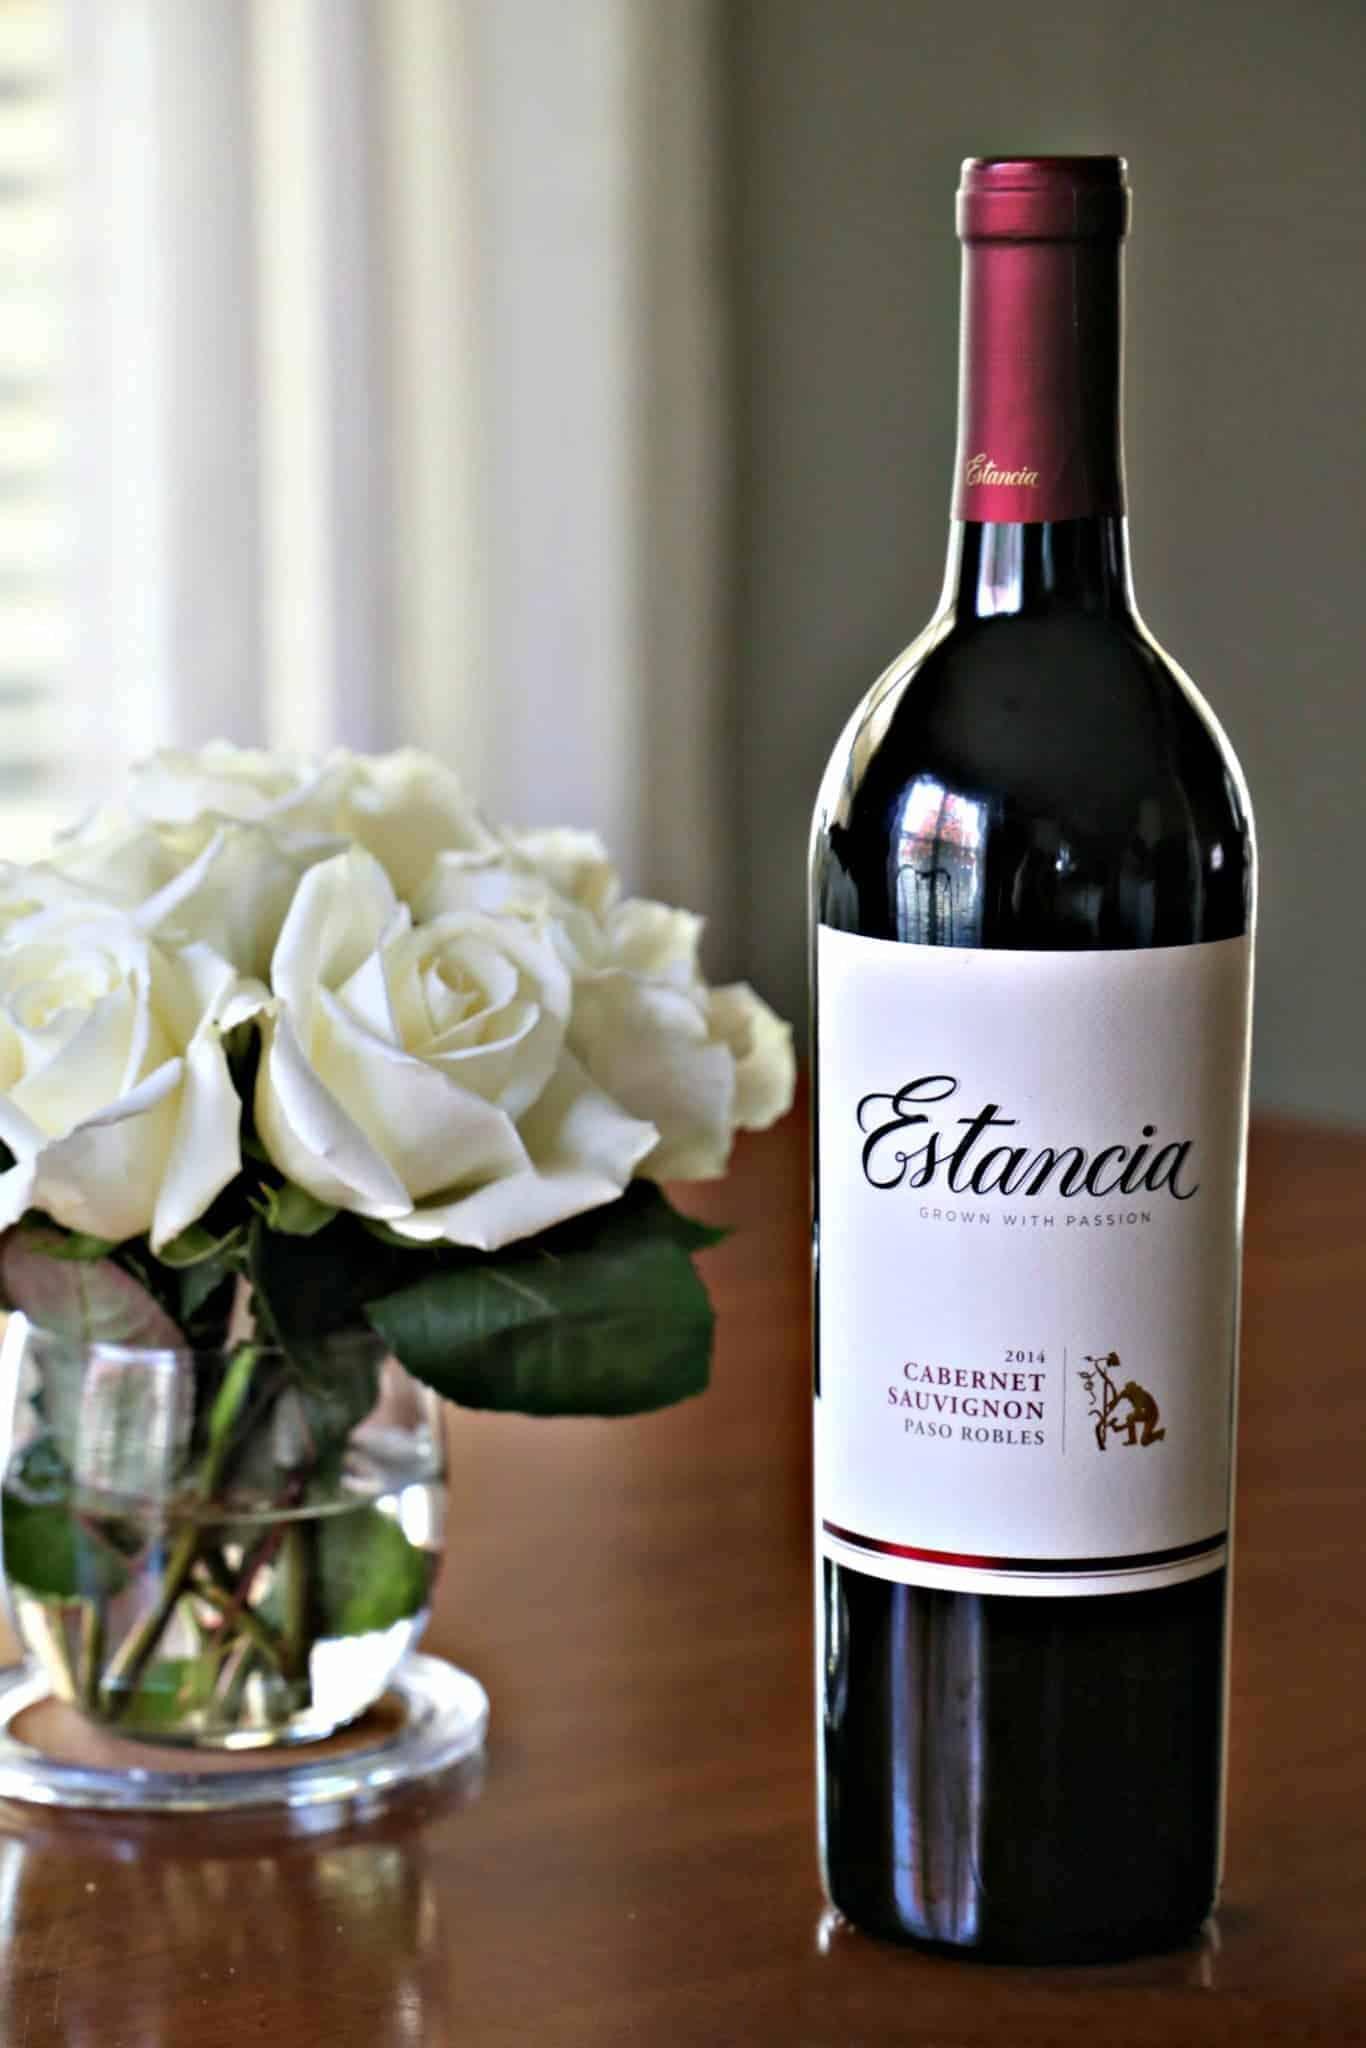 bottle of Estancia's Cabernet Sauvignon